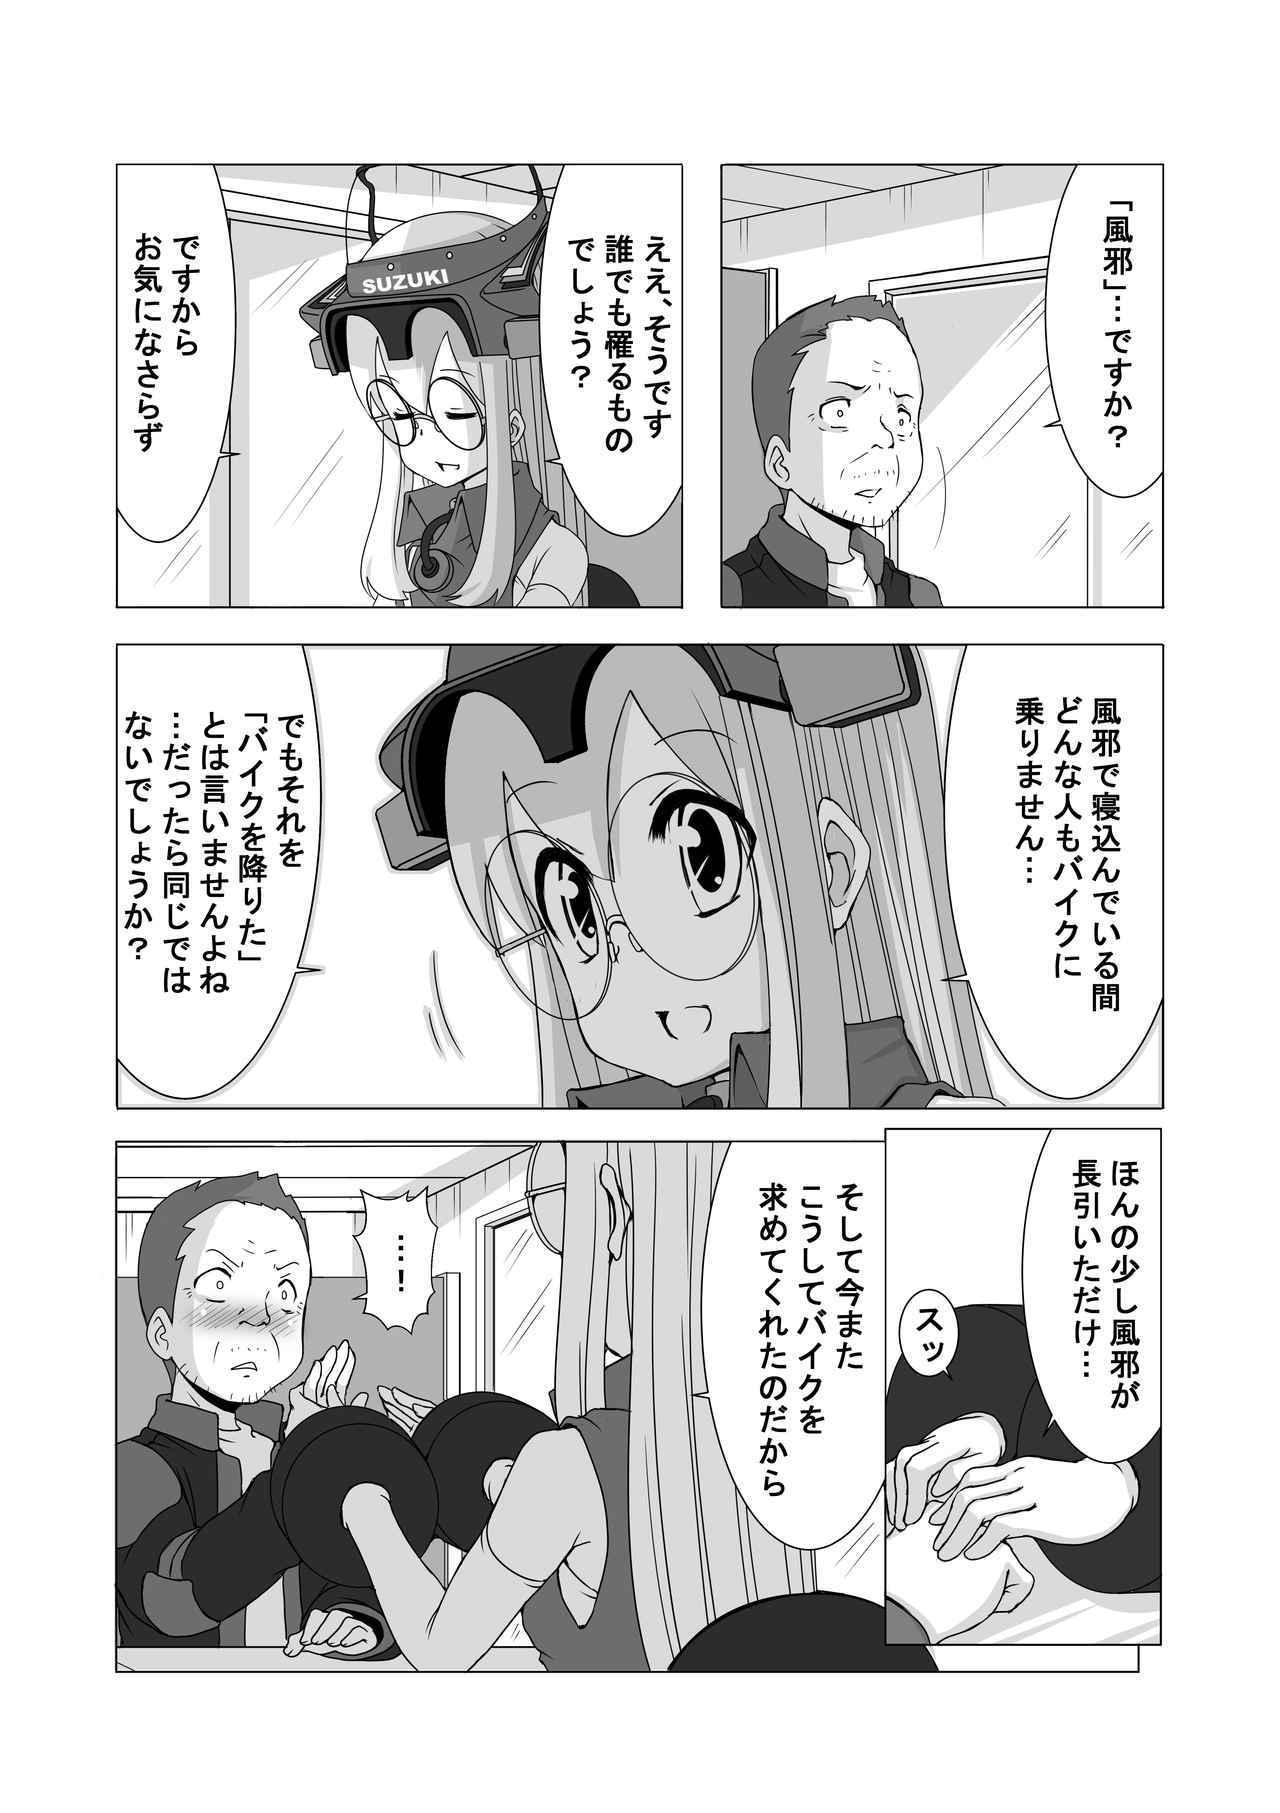 画像2: 『バイク擬人化菌書』単行本 第1〜5巻、好評発売中!